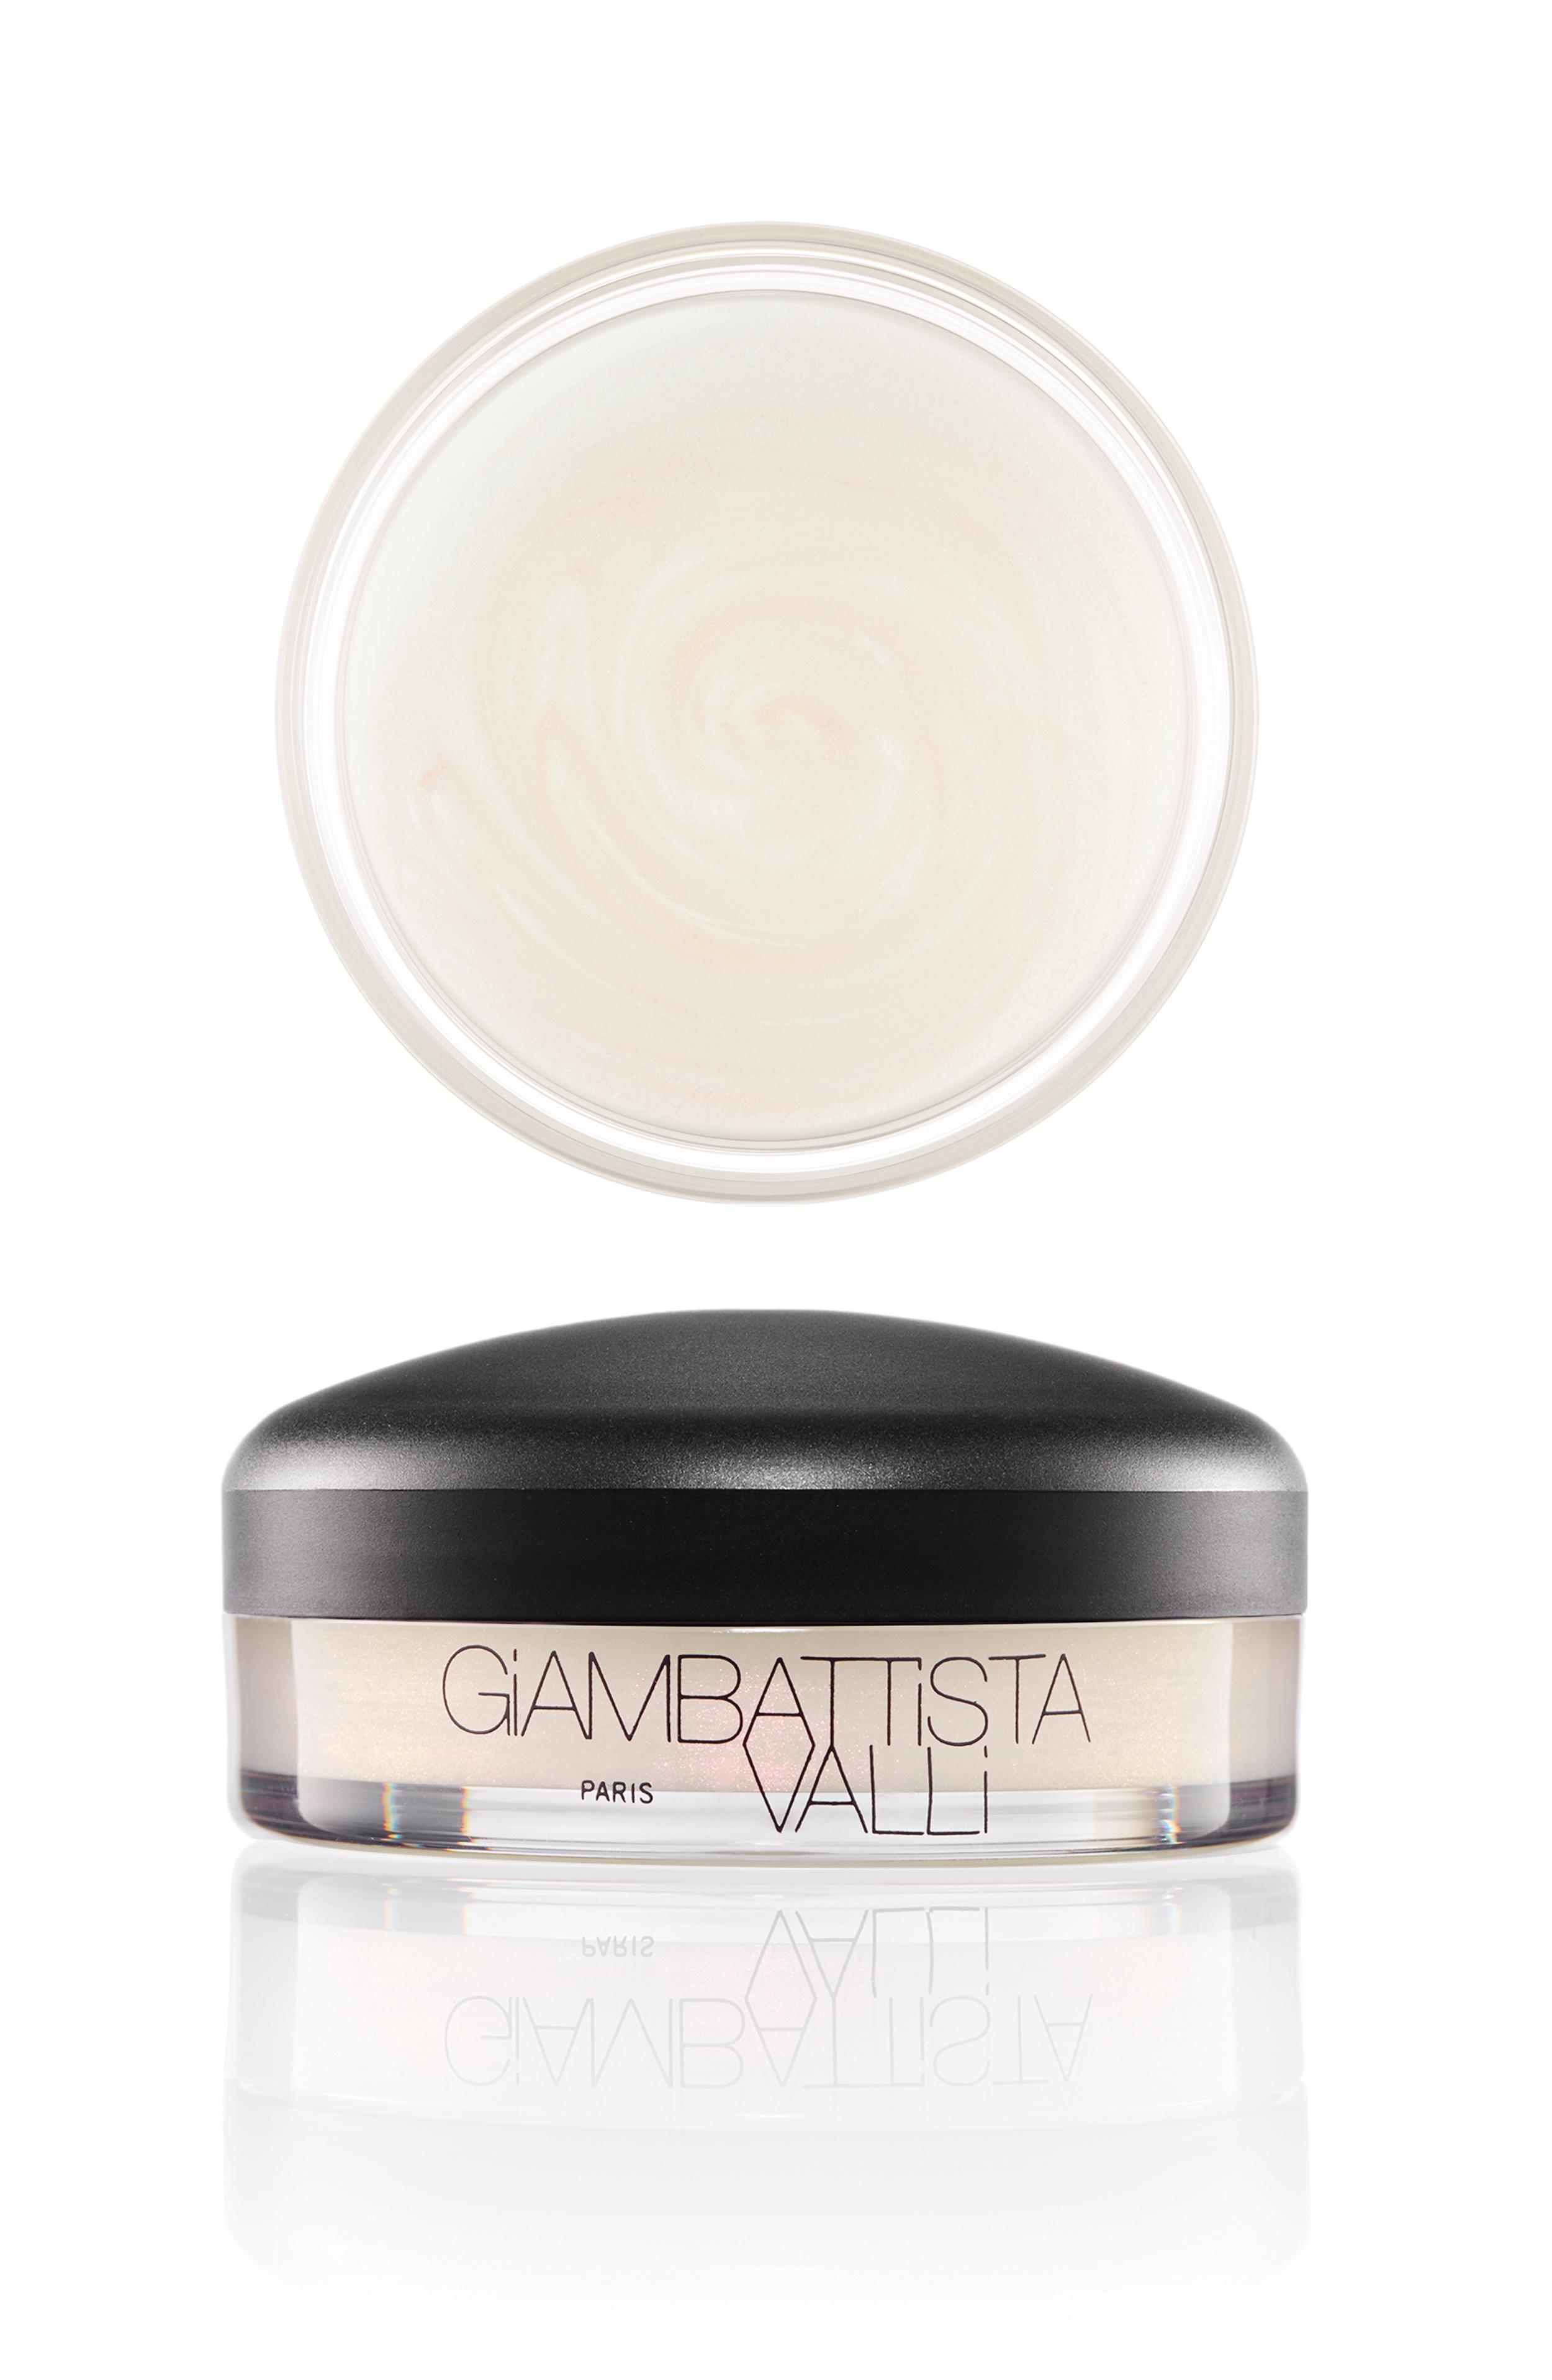 Mac Cosmetics X Selena Quintanilla Collection Info: First Look: MAC Cosmetics X Giambattista Valli Lipstick